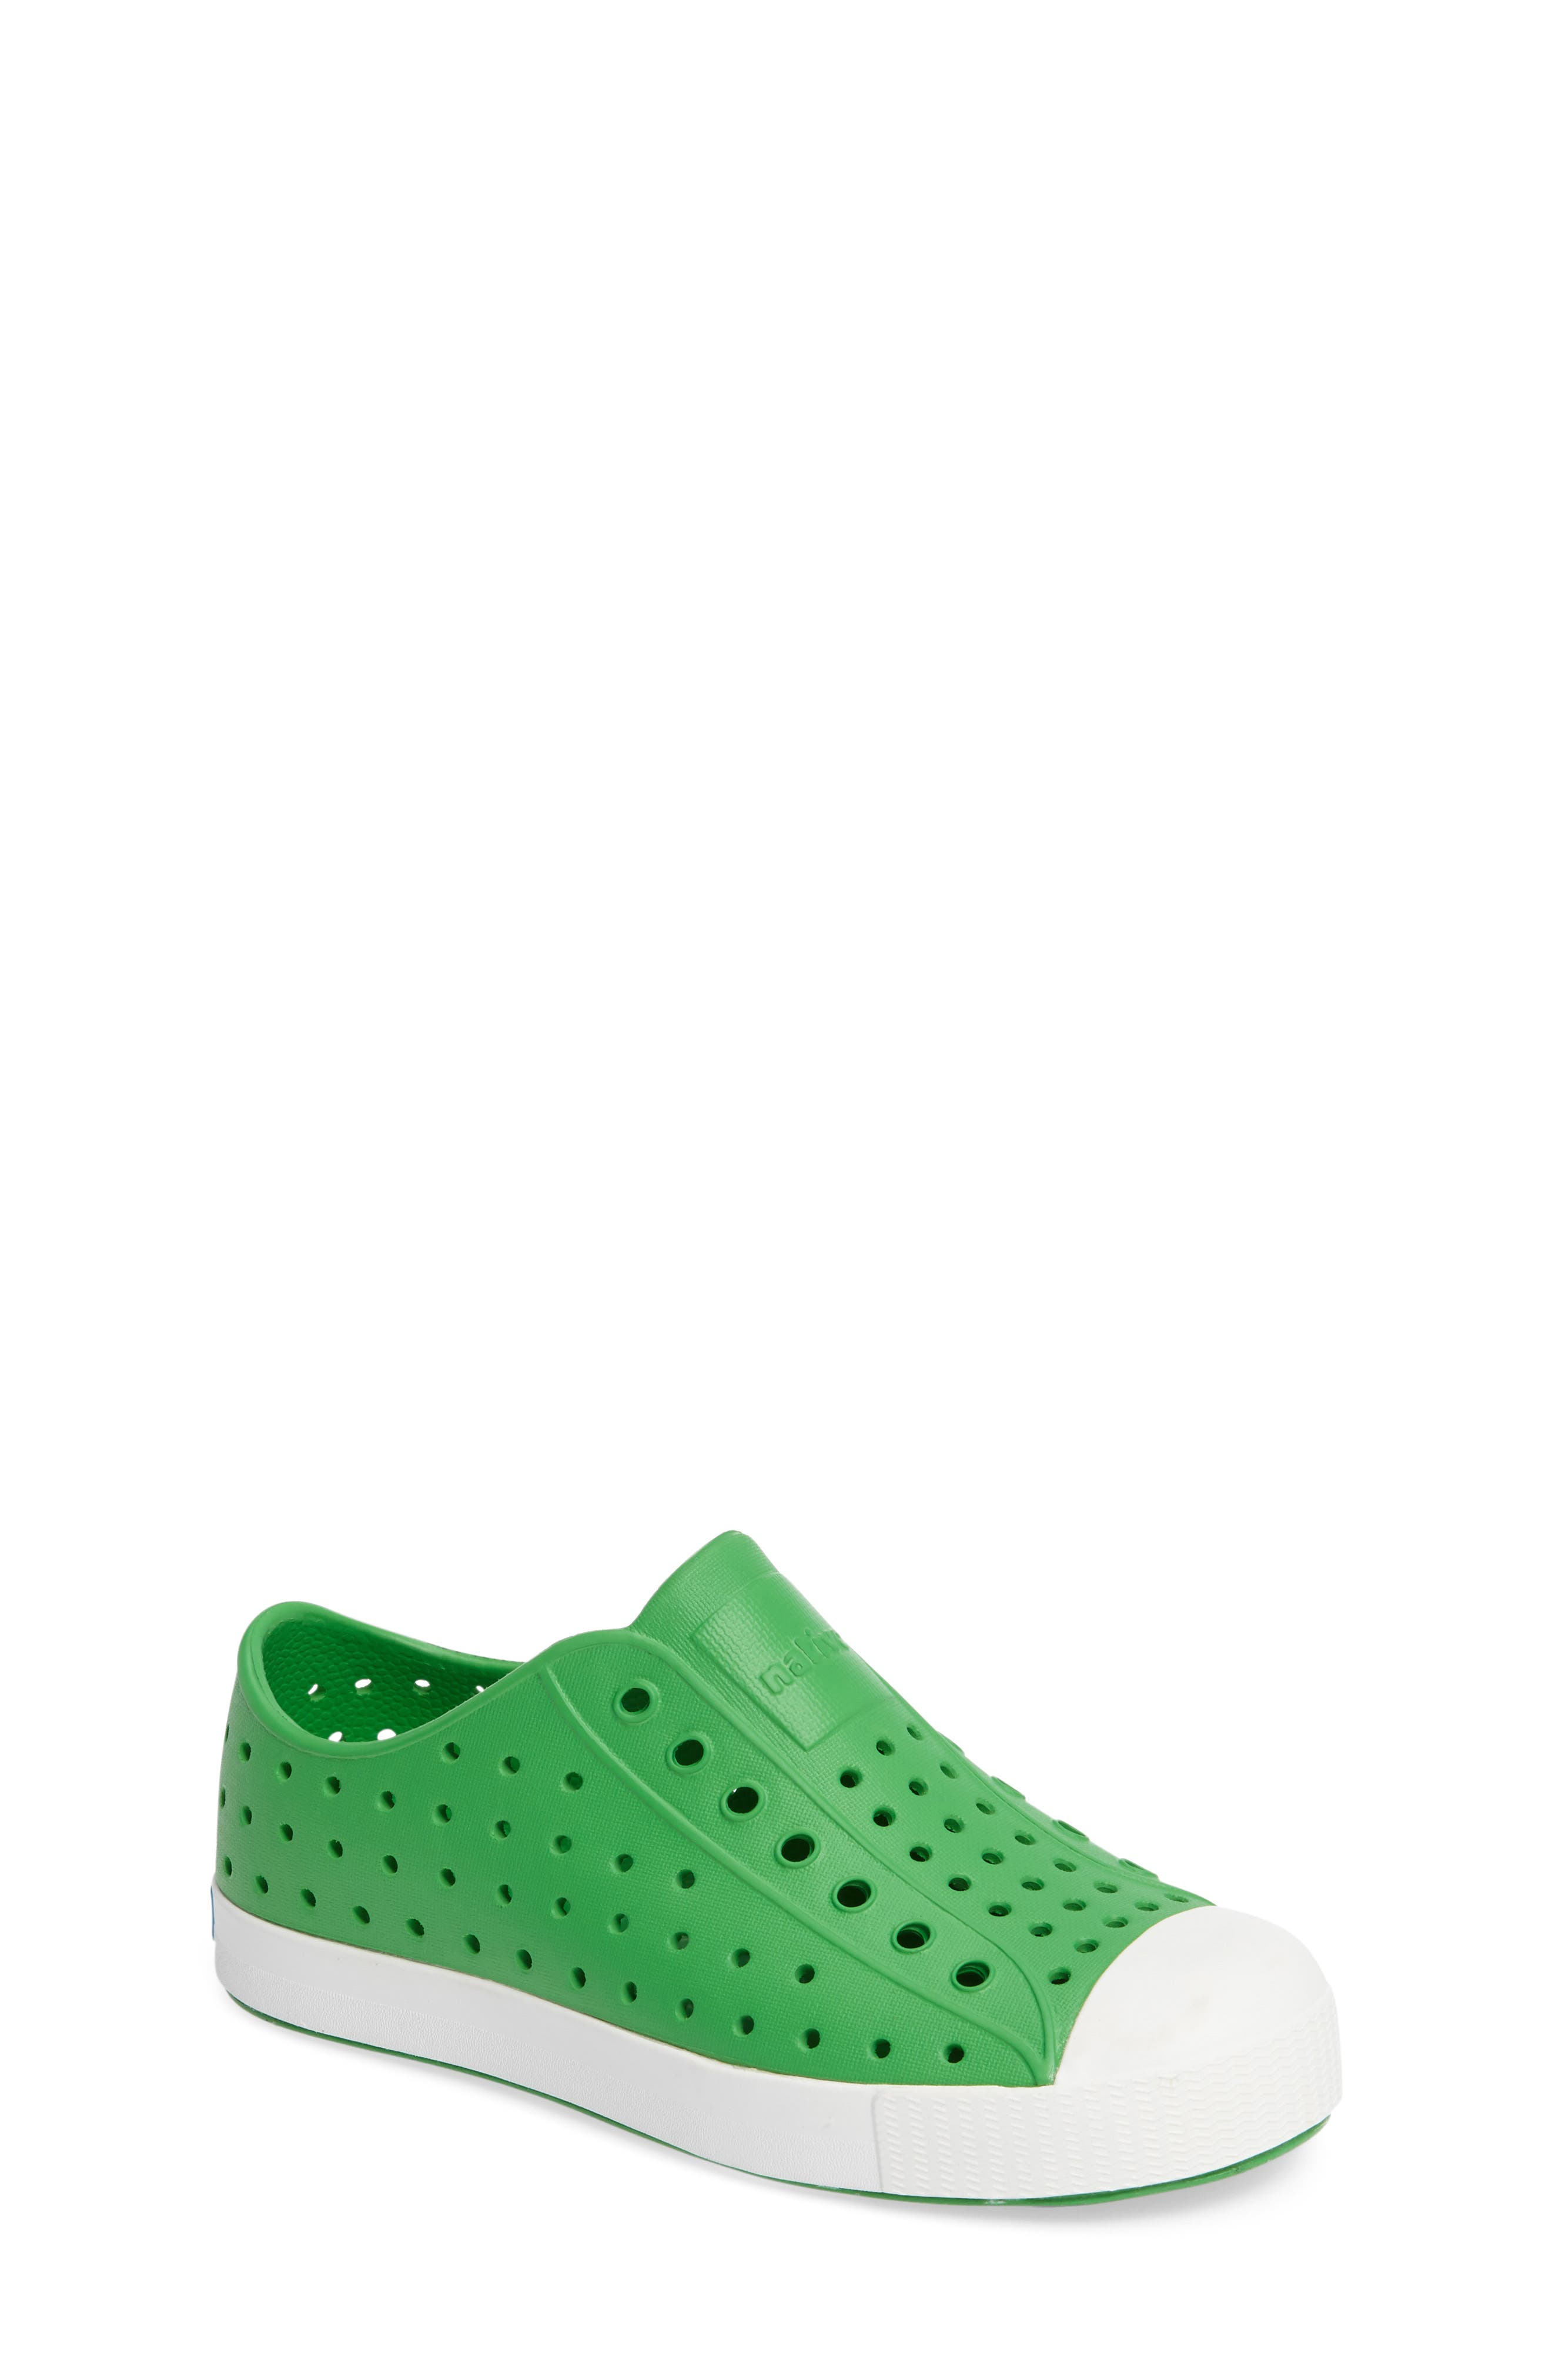 'Jefferson' Water Friendly Slip-On Sneaker,                             Main thumbnail 67, color,